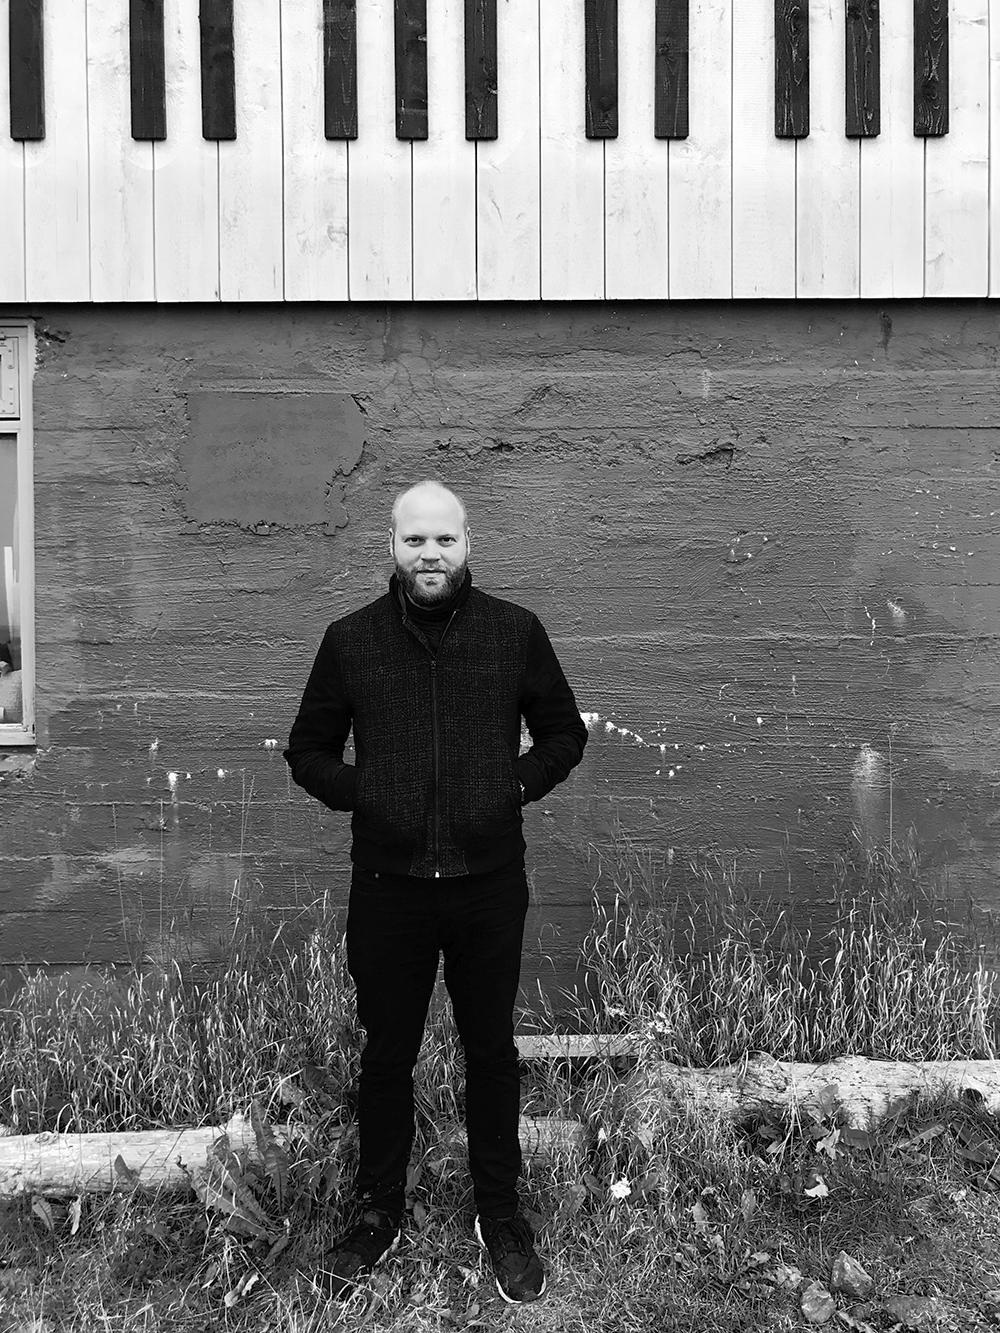 Bjarni-Biering-icelandic-composer.jpg